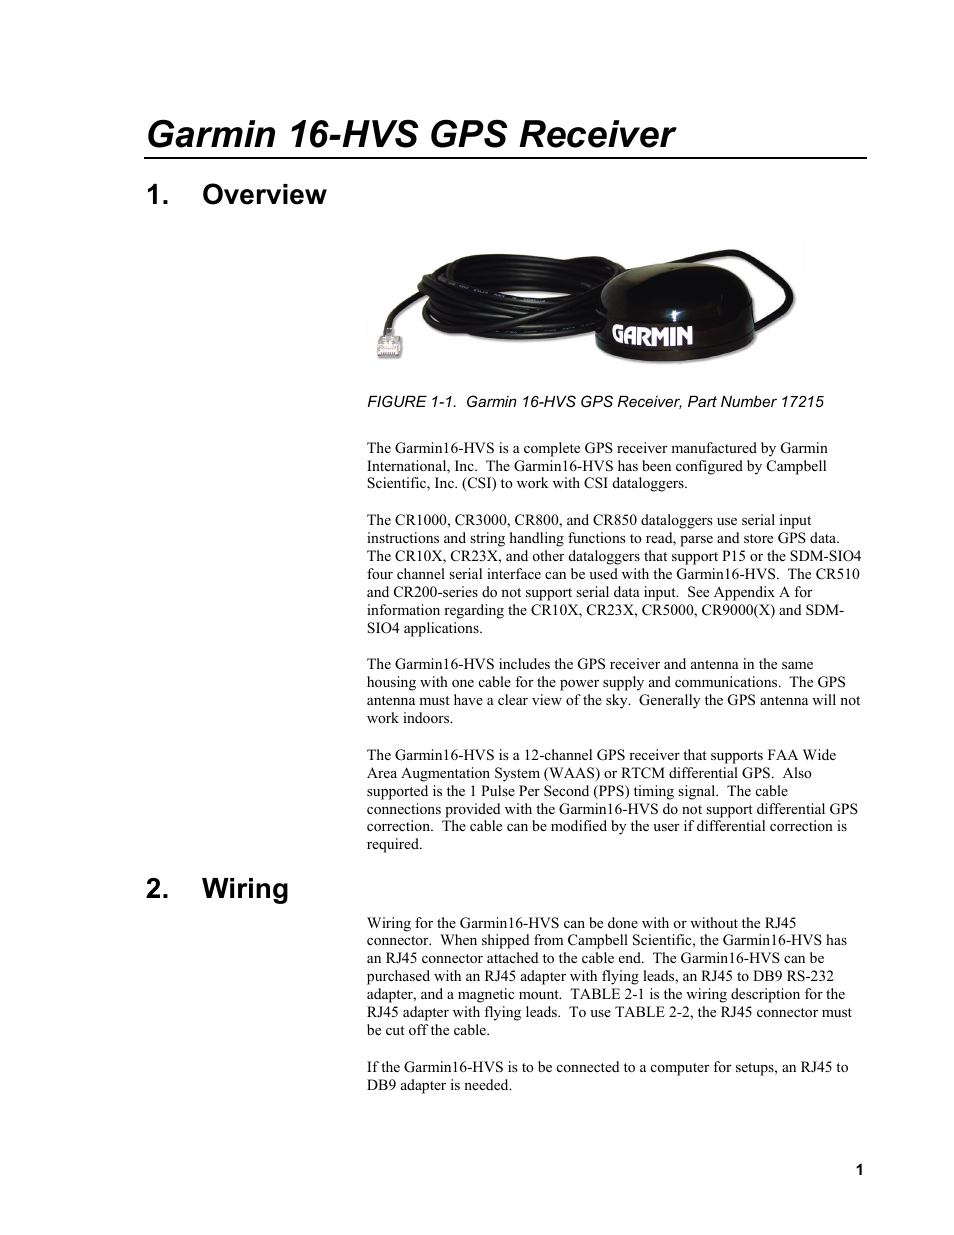 Overview, Wiring, 1  garmin 16-hvs gps receiver, part number 17215